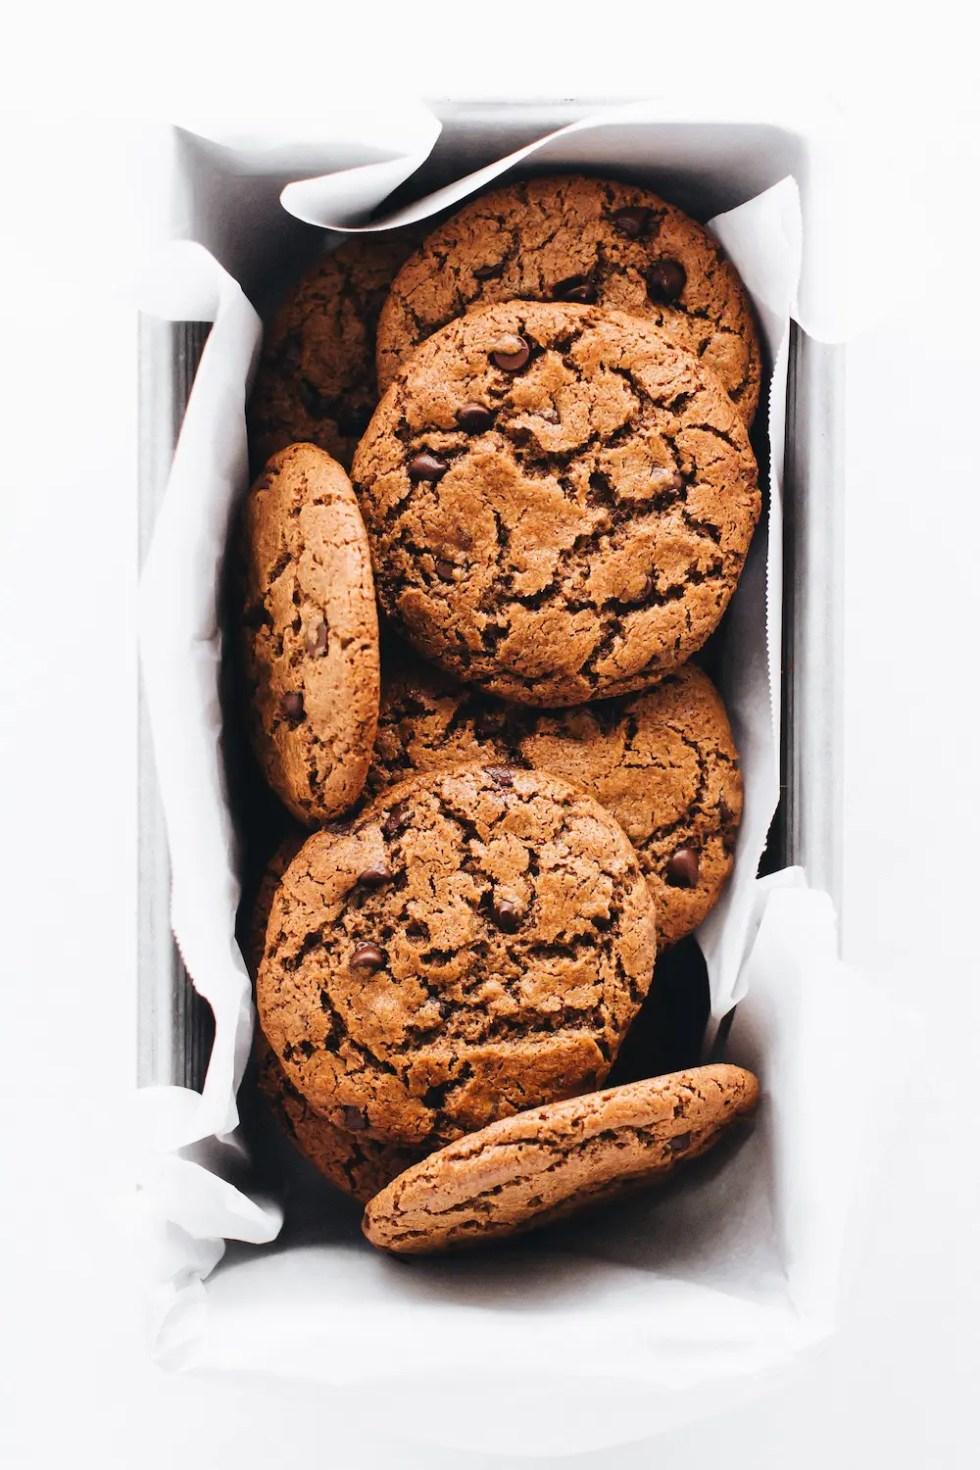 Crispy Chocolate Chip Cookies (Vegan + Paleo)